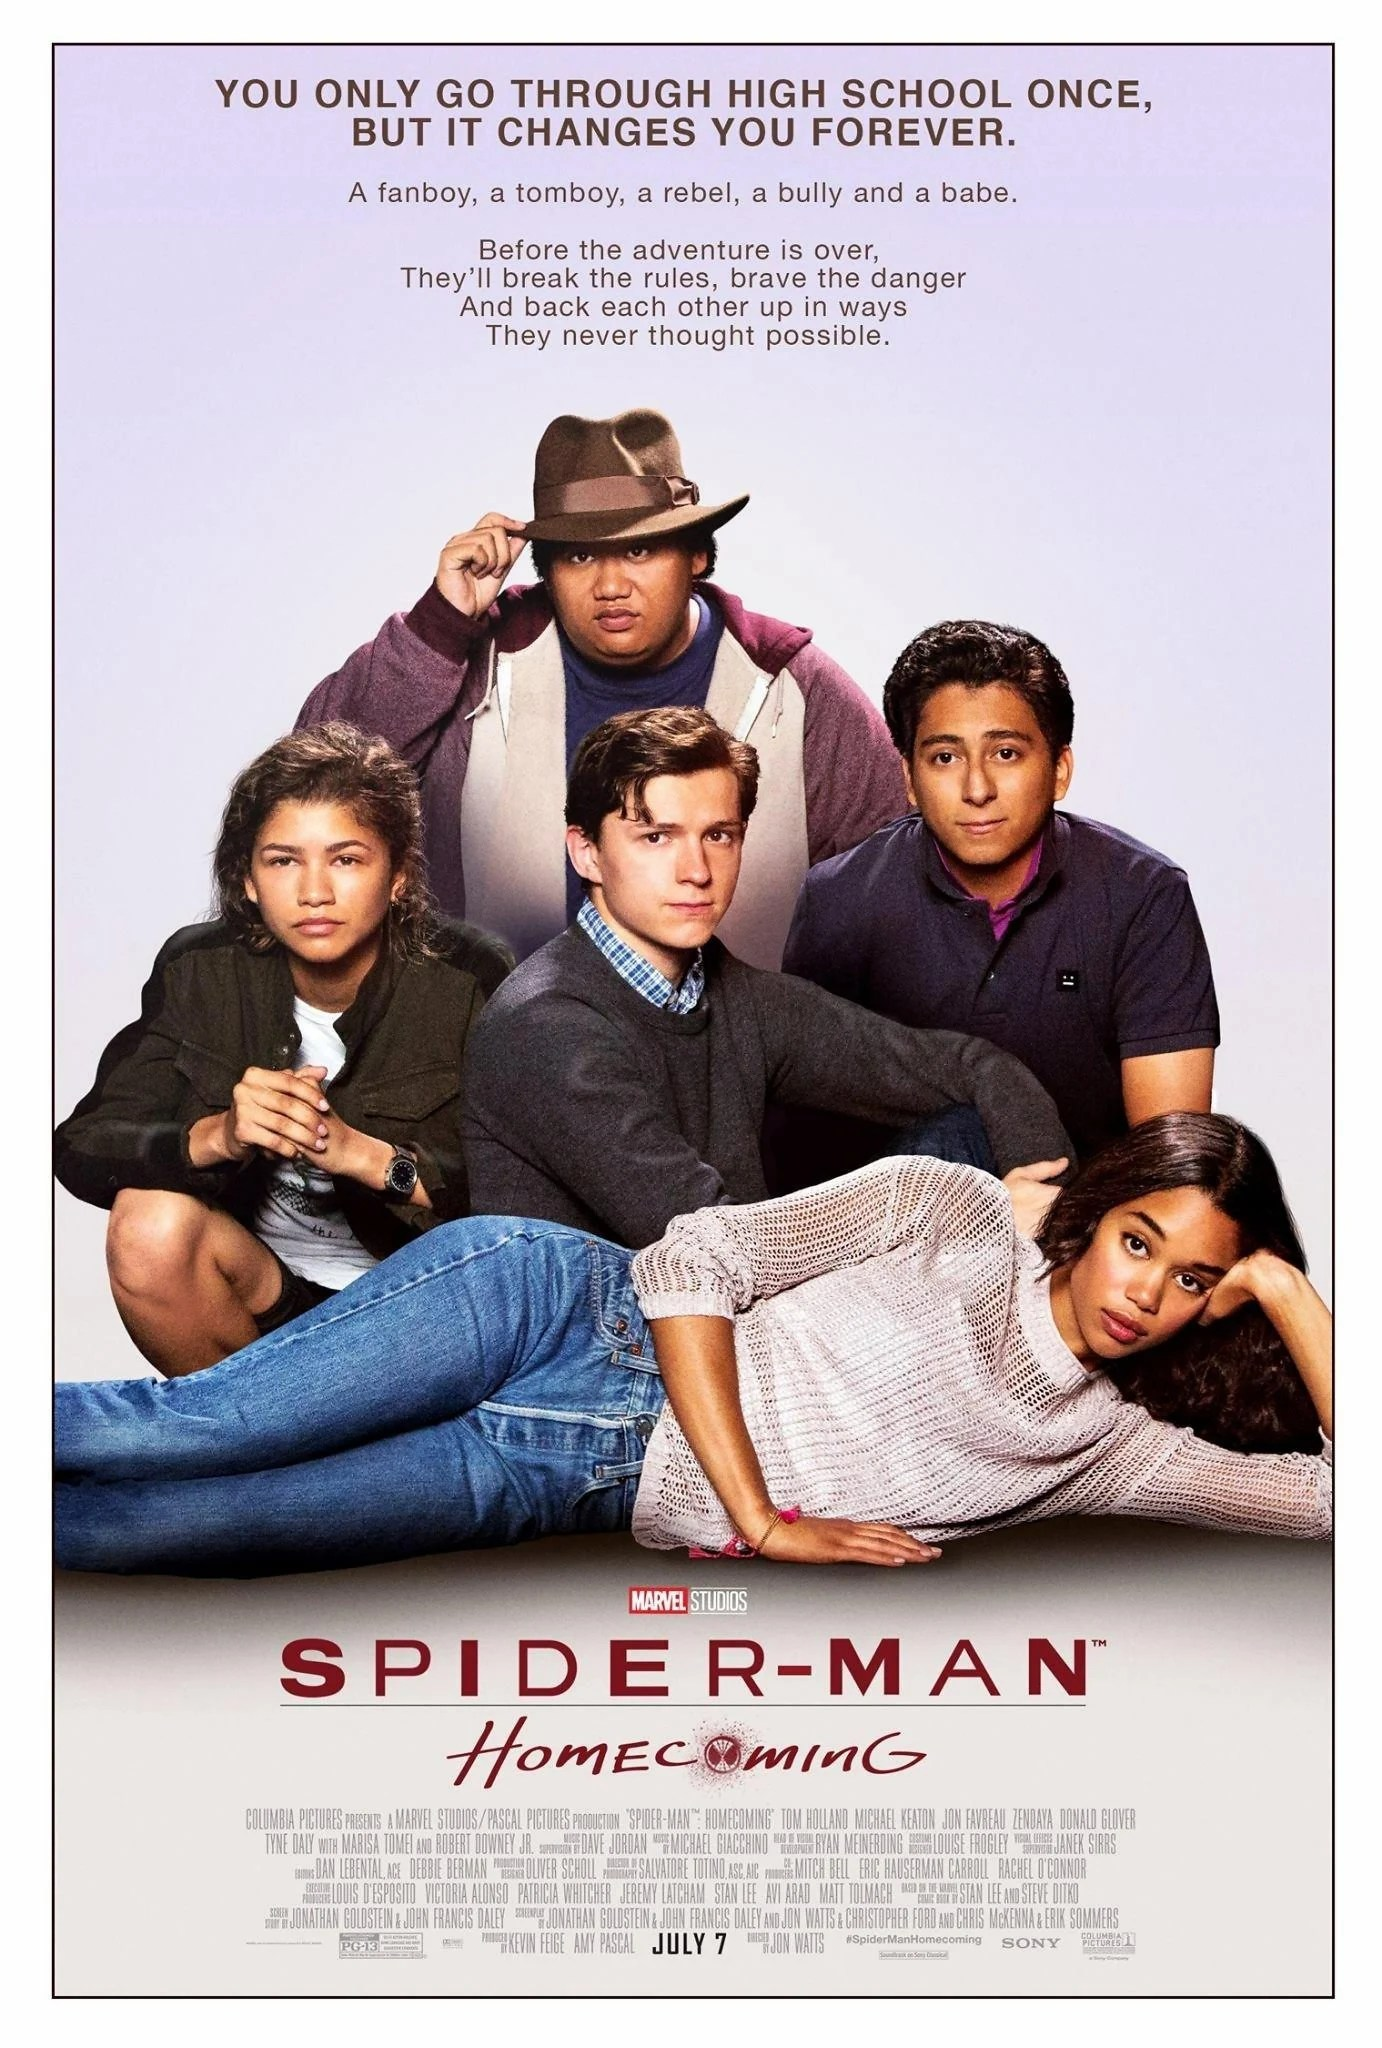 spider man homecoming retro breakfast club parody poster 2017 movie marvel rare print